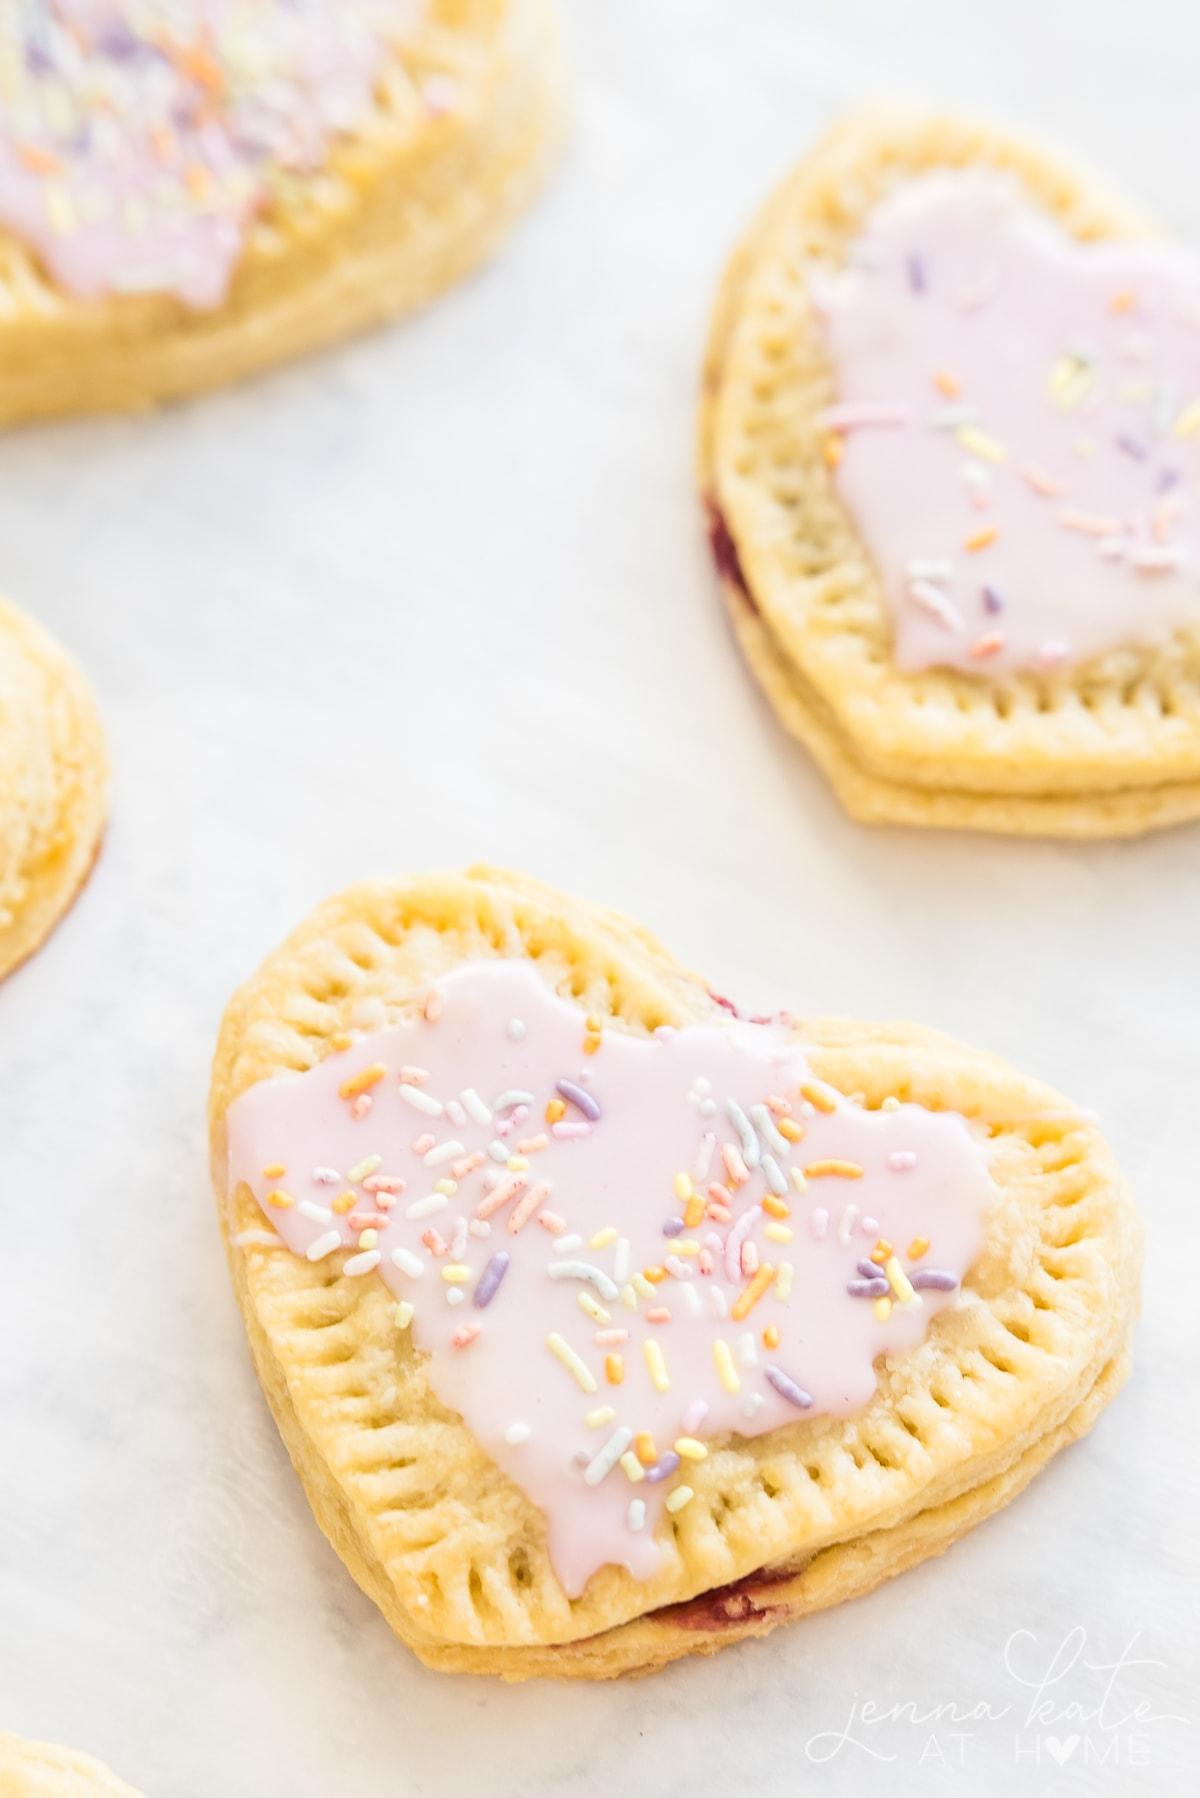 Homemade heart shaped pop tarts with vanilla icing